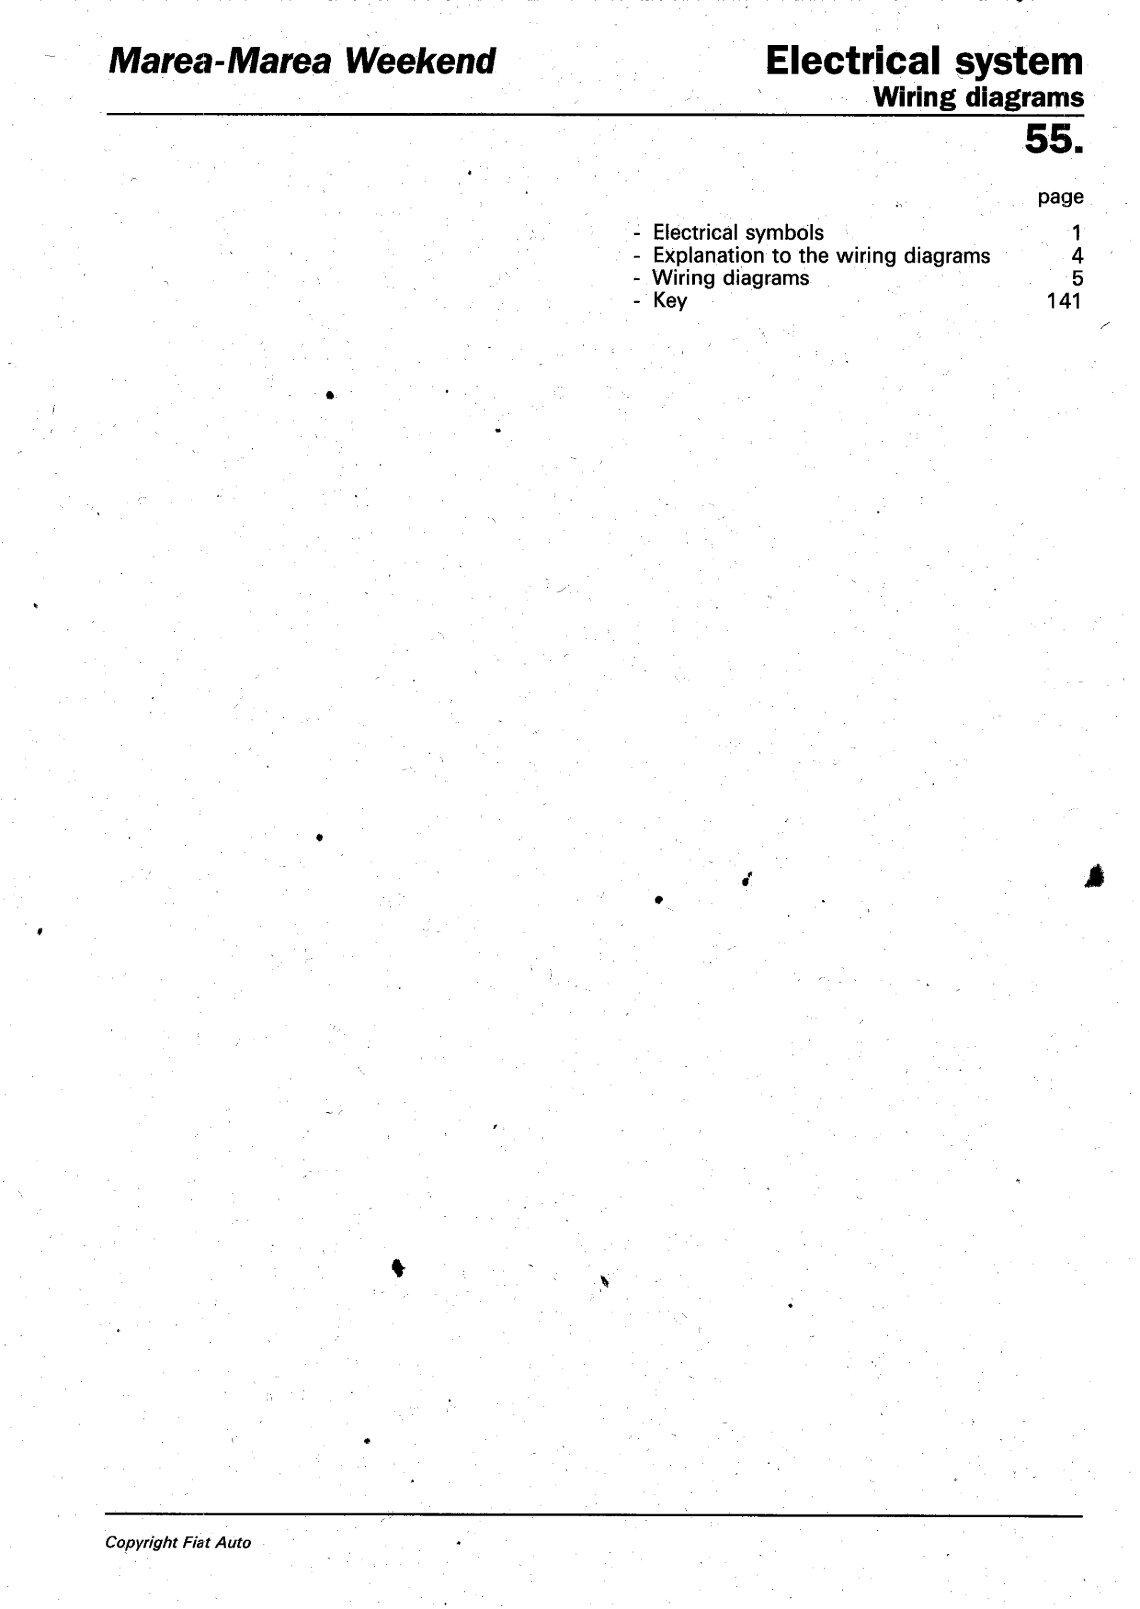 hight resolution of fiat palio weekend wiring diagram question about wiring diagram u2022 1977 fiat 124 spider wiring diagram fiat palio wiring diagram pdf